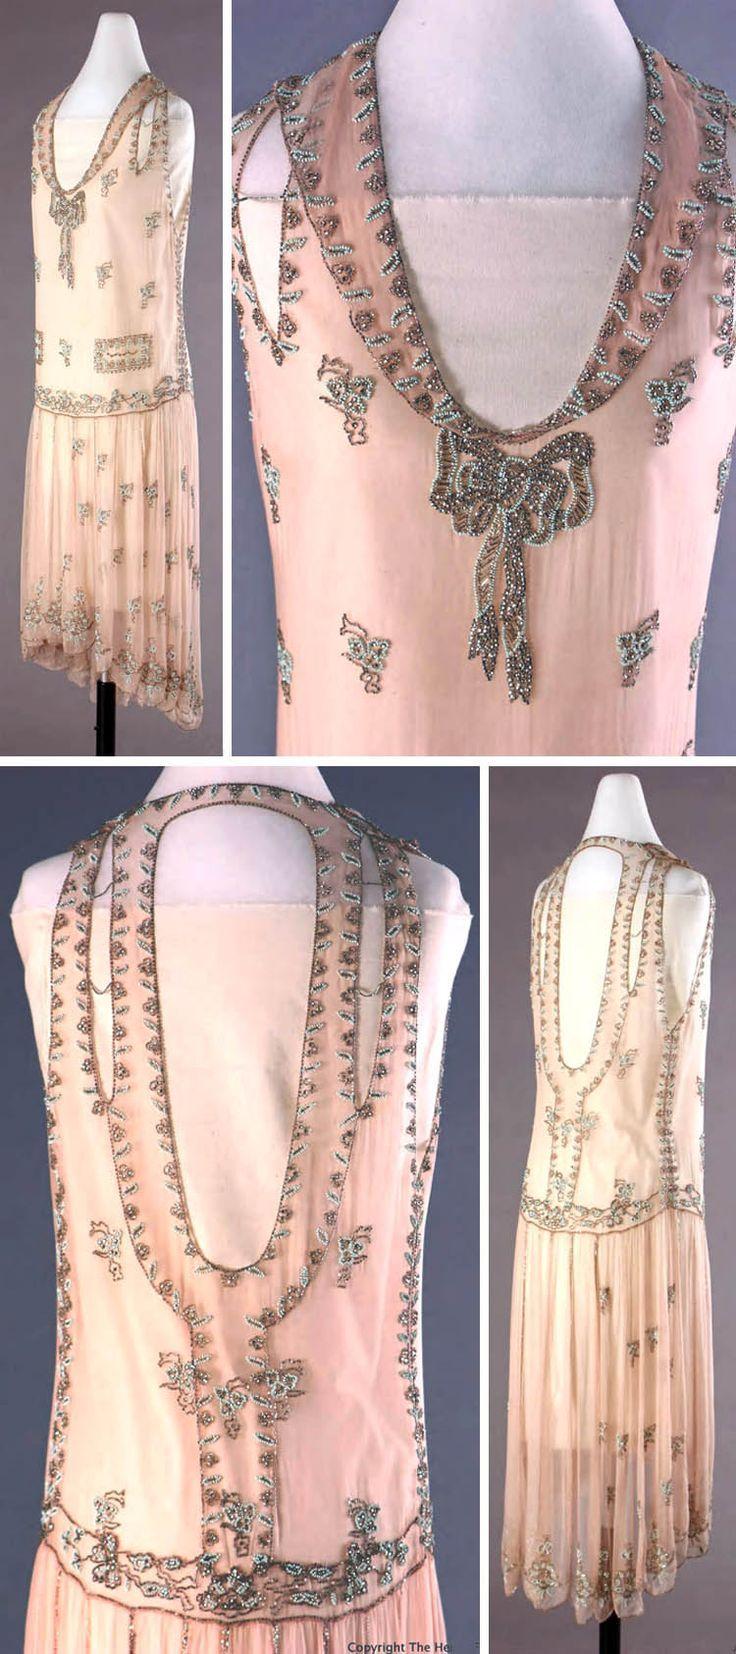 Evening dress, circa 1928-1929.